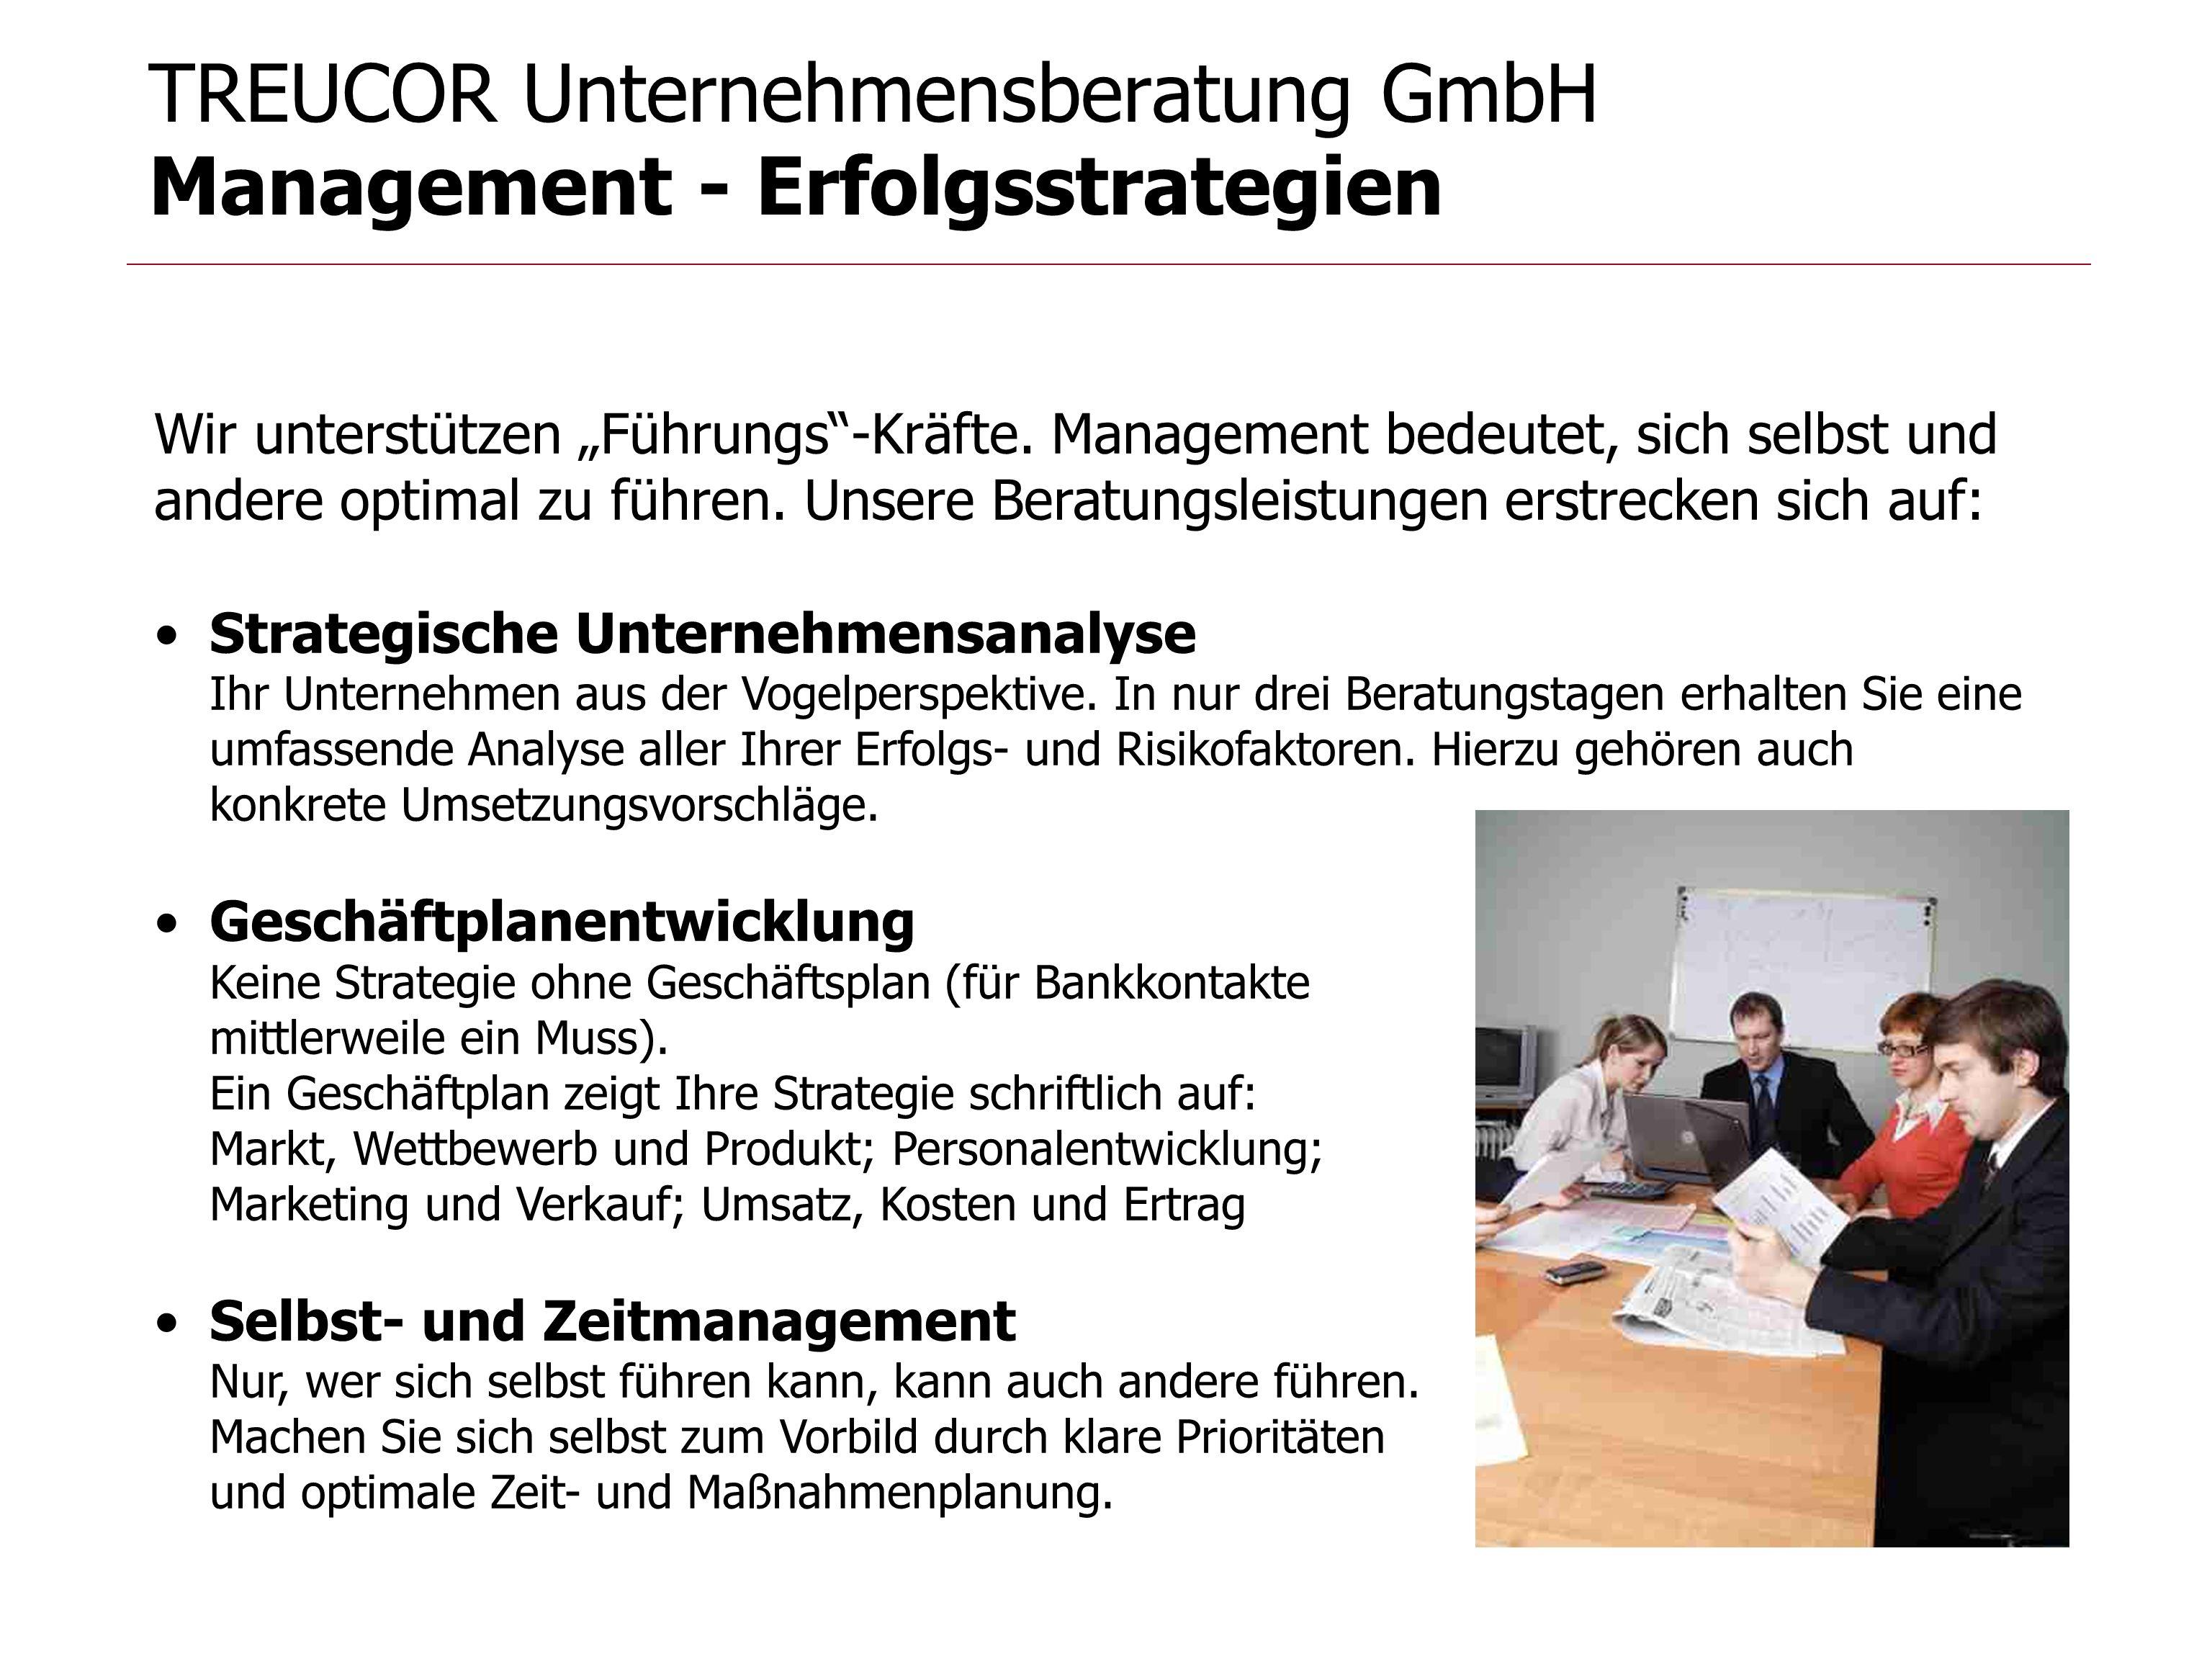 TREUCOR Unternehmensberatung GmbH Management - Erfolgsstrategien